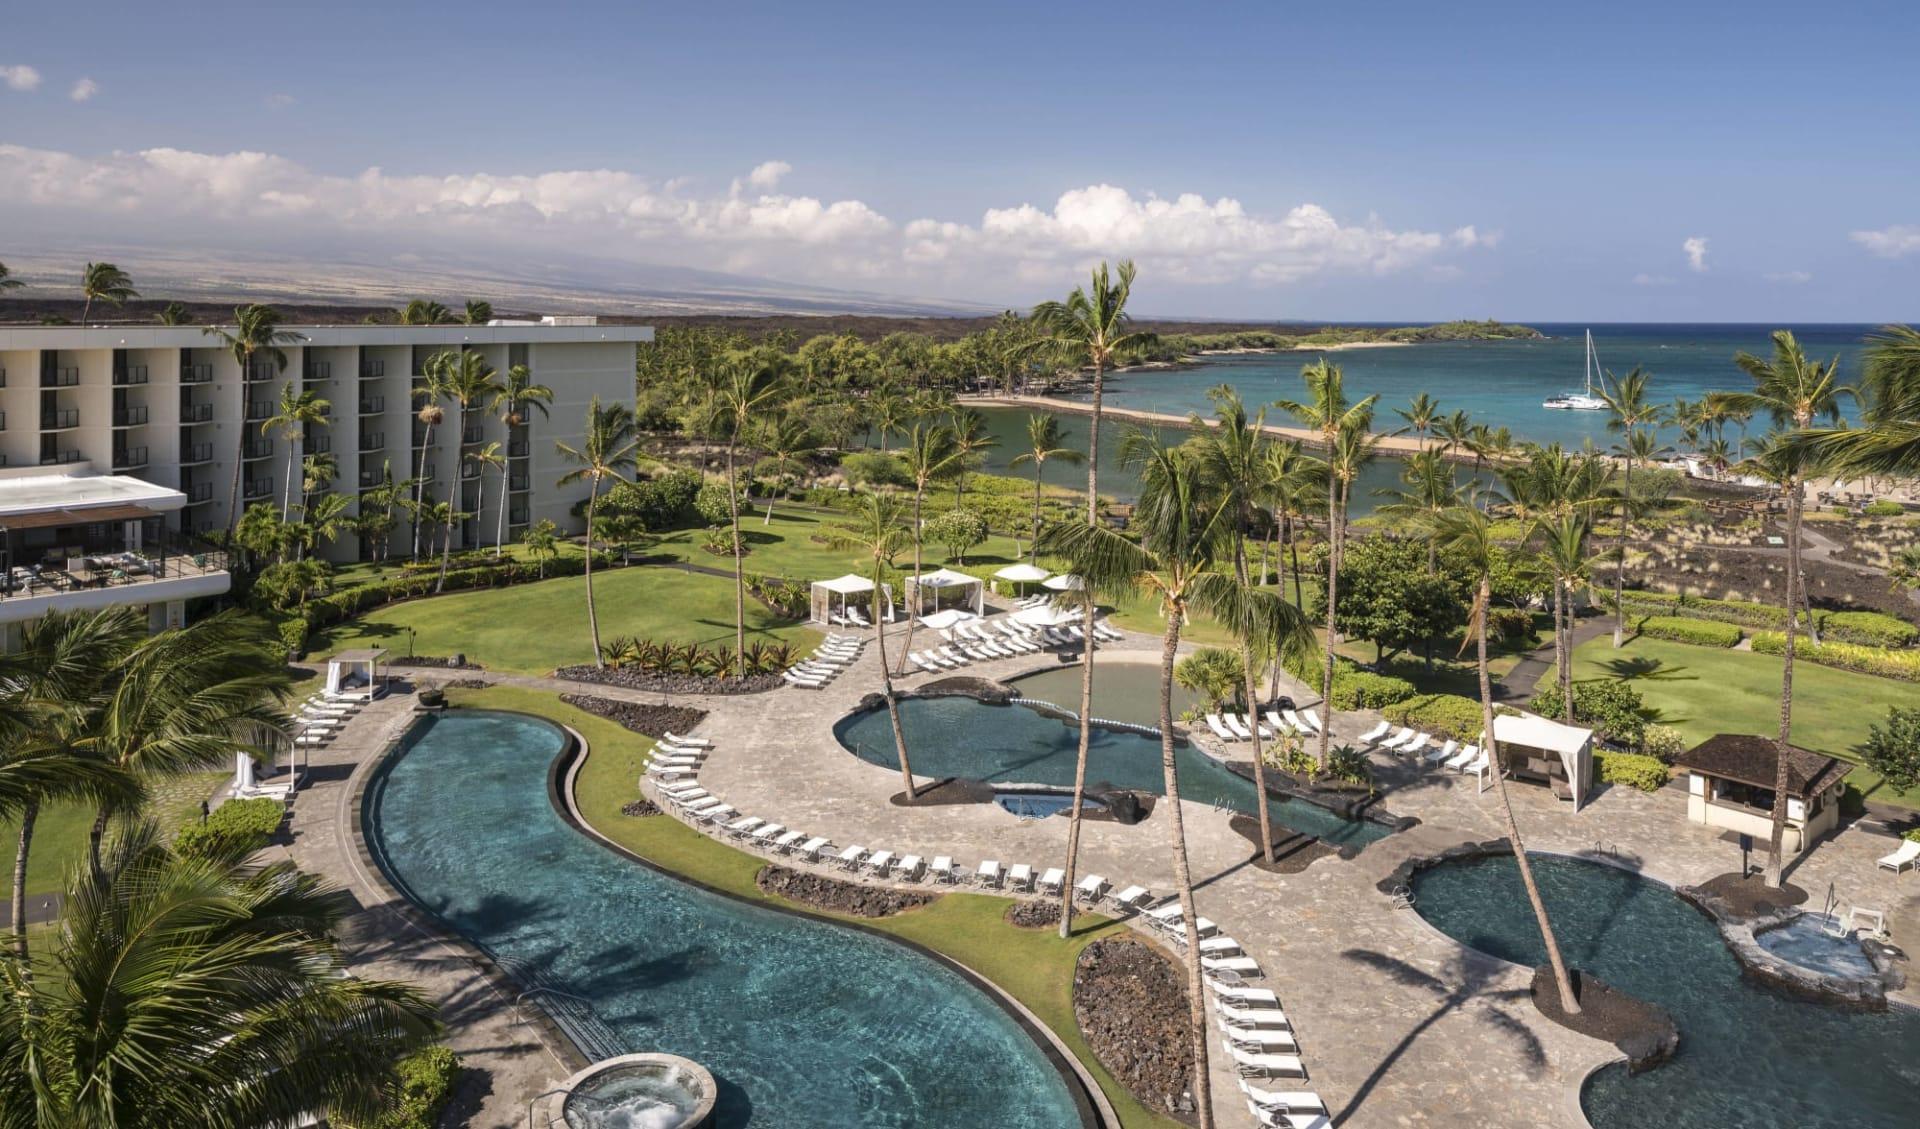 Waikoloa Beach Marriott Resort & Spa: Waikoloa Beach Marriott_Areal View_Hotelchain